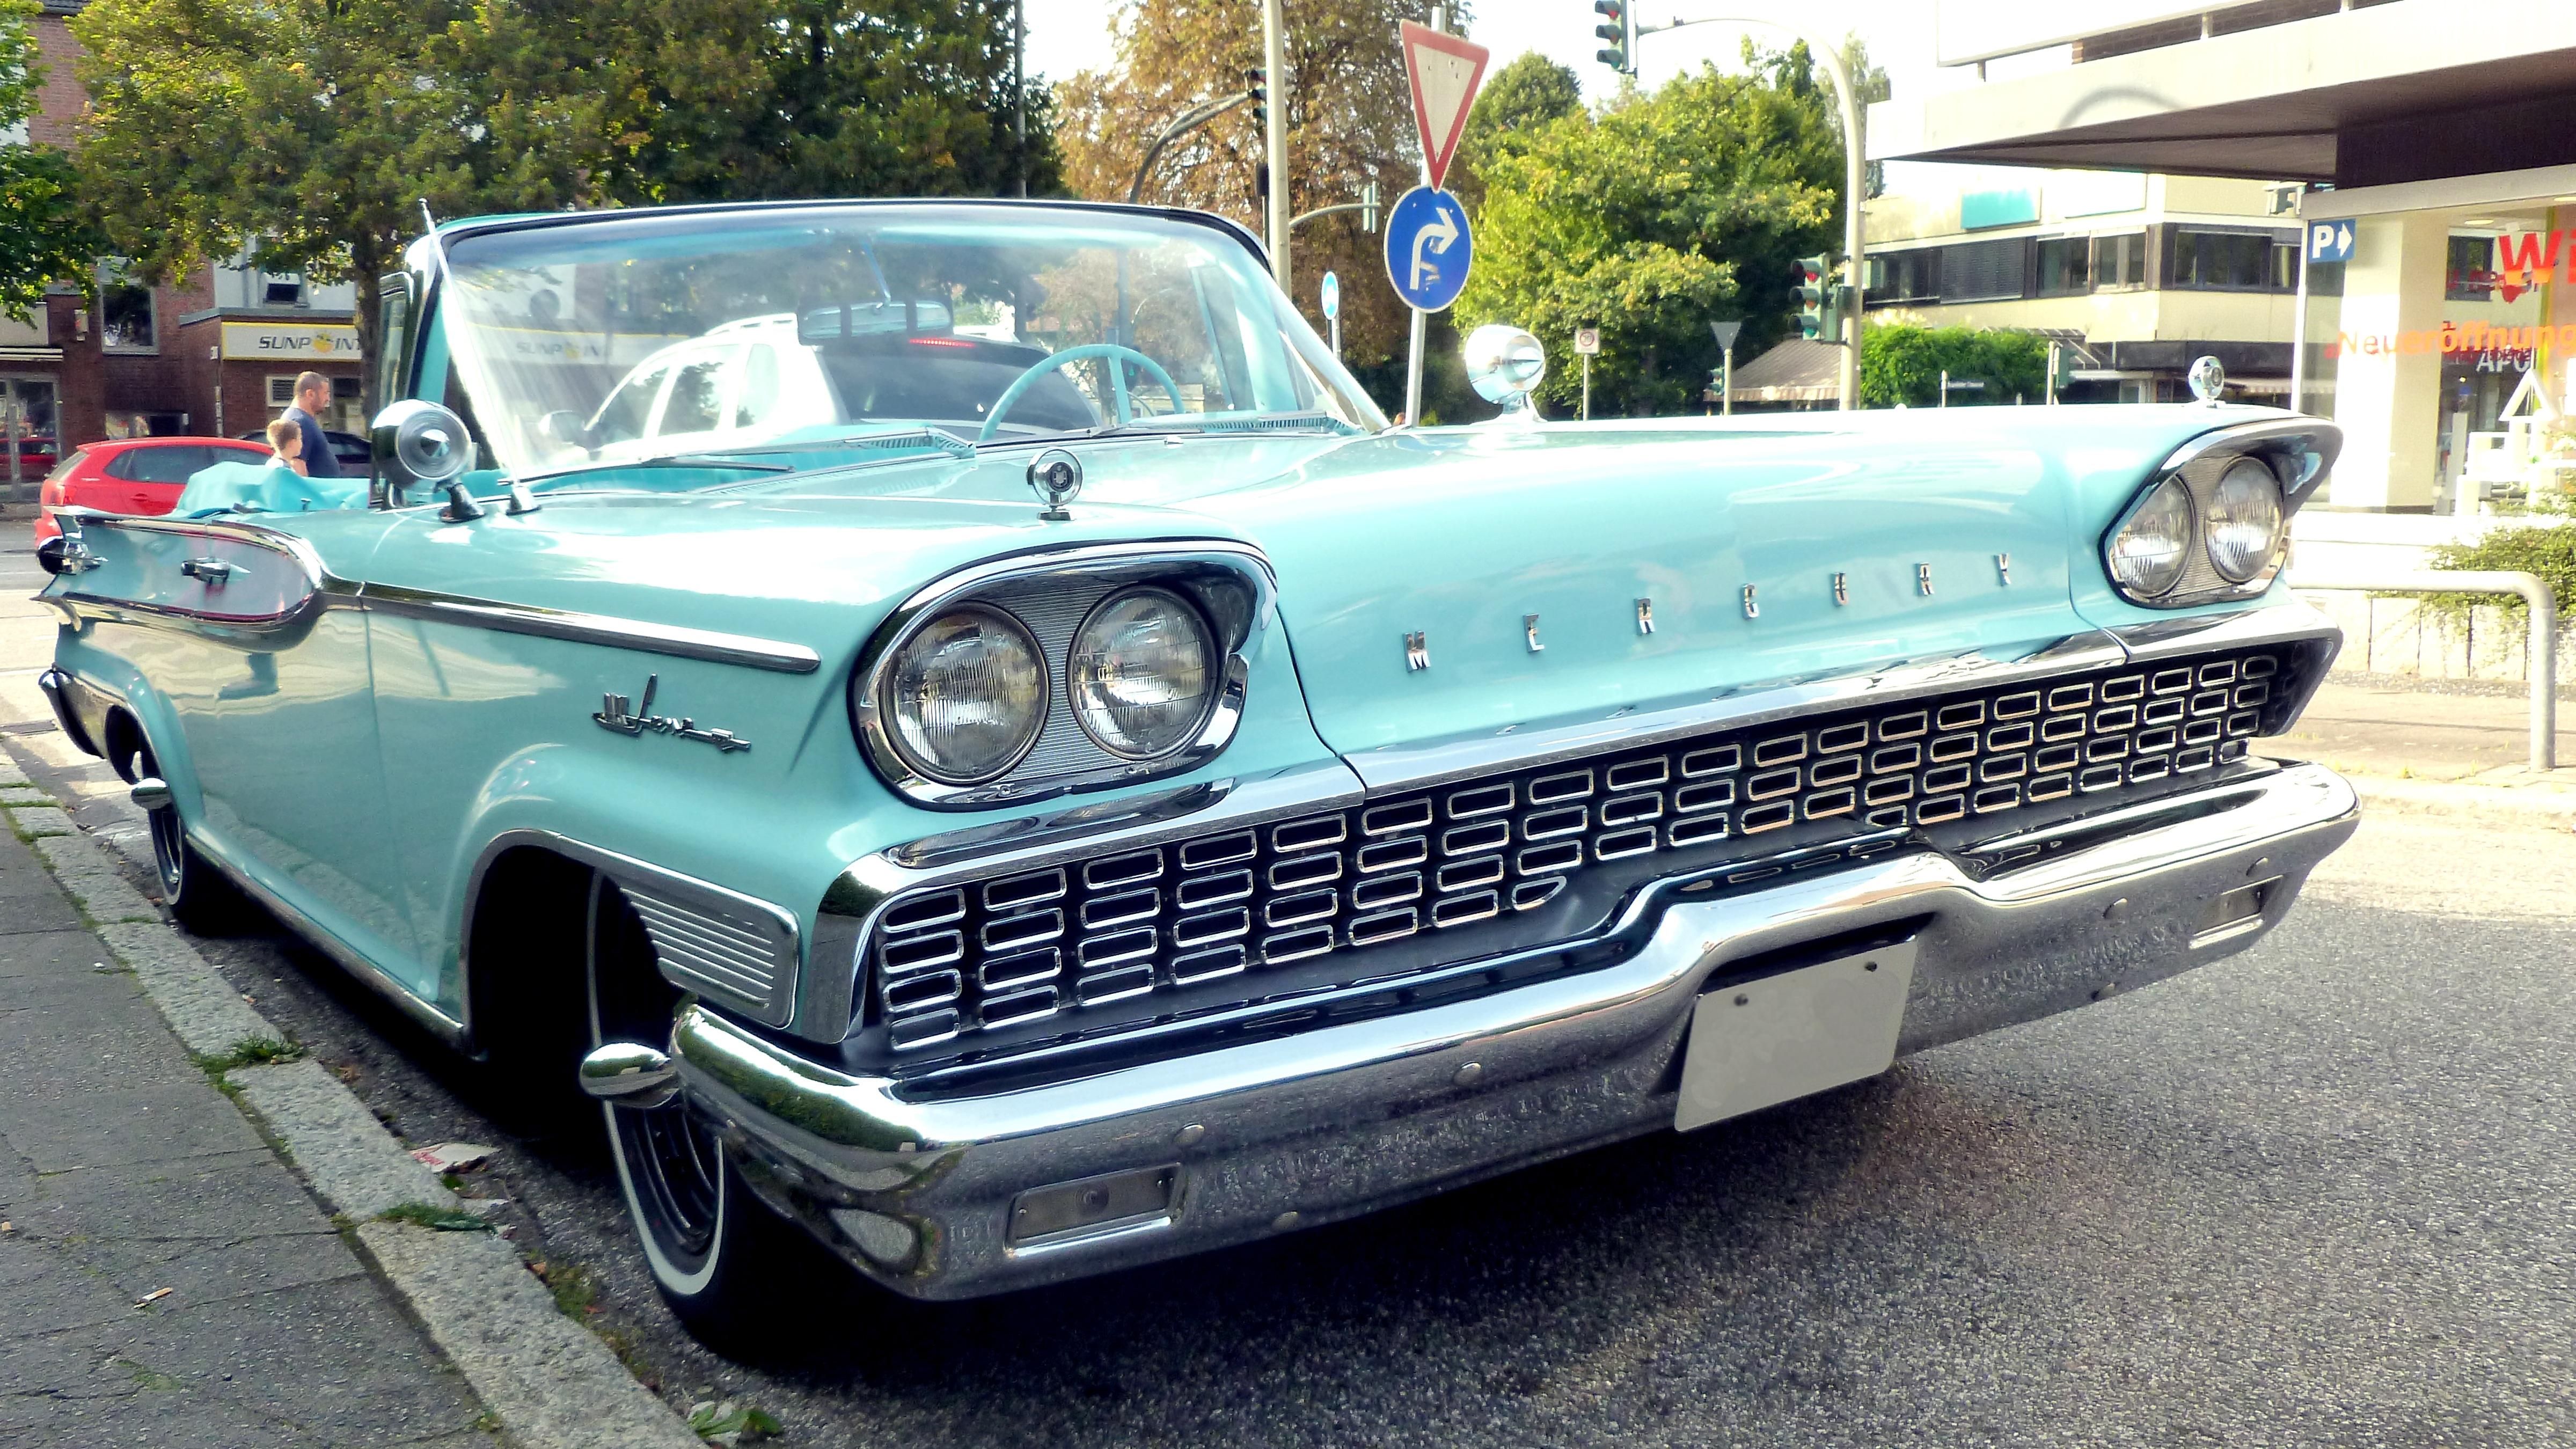 Free Images Vintage Retro Usa Auto Nostalgia Old Car Spotlight Clic Per Cars Sedan Oldtimer Convertible Mercury V8 Pkw